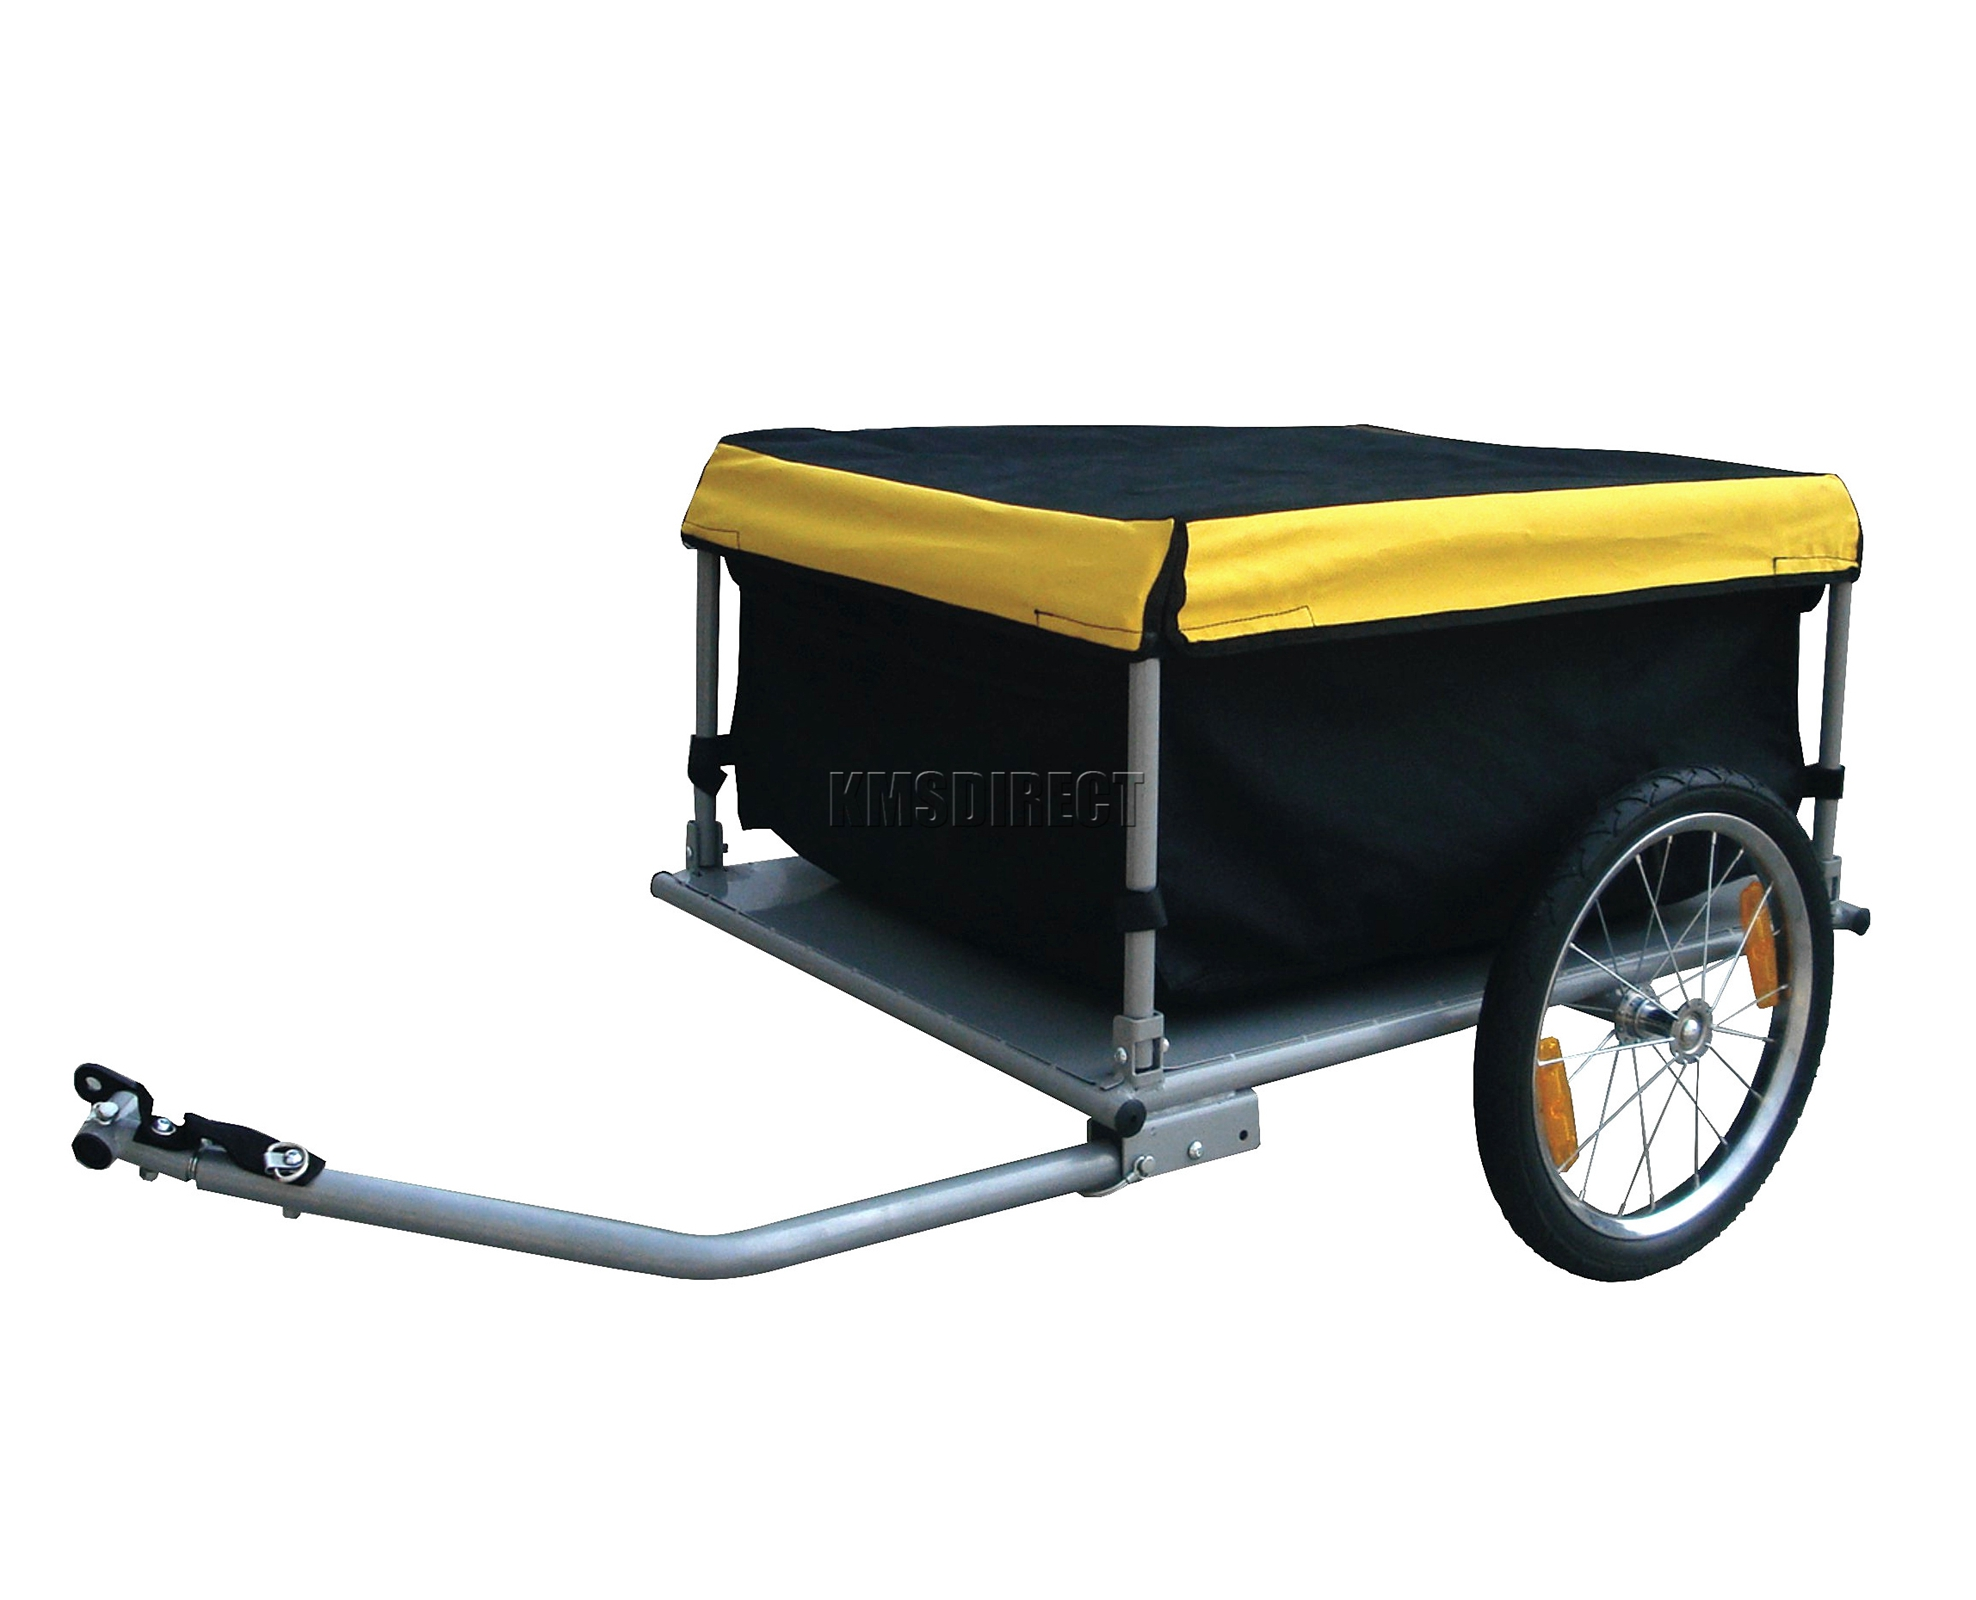 Bike Cargo Carrier : New children child kids luggage cargo bike bicycle trailer